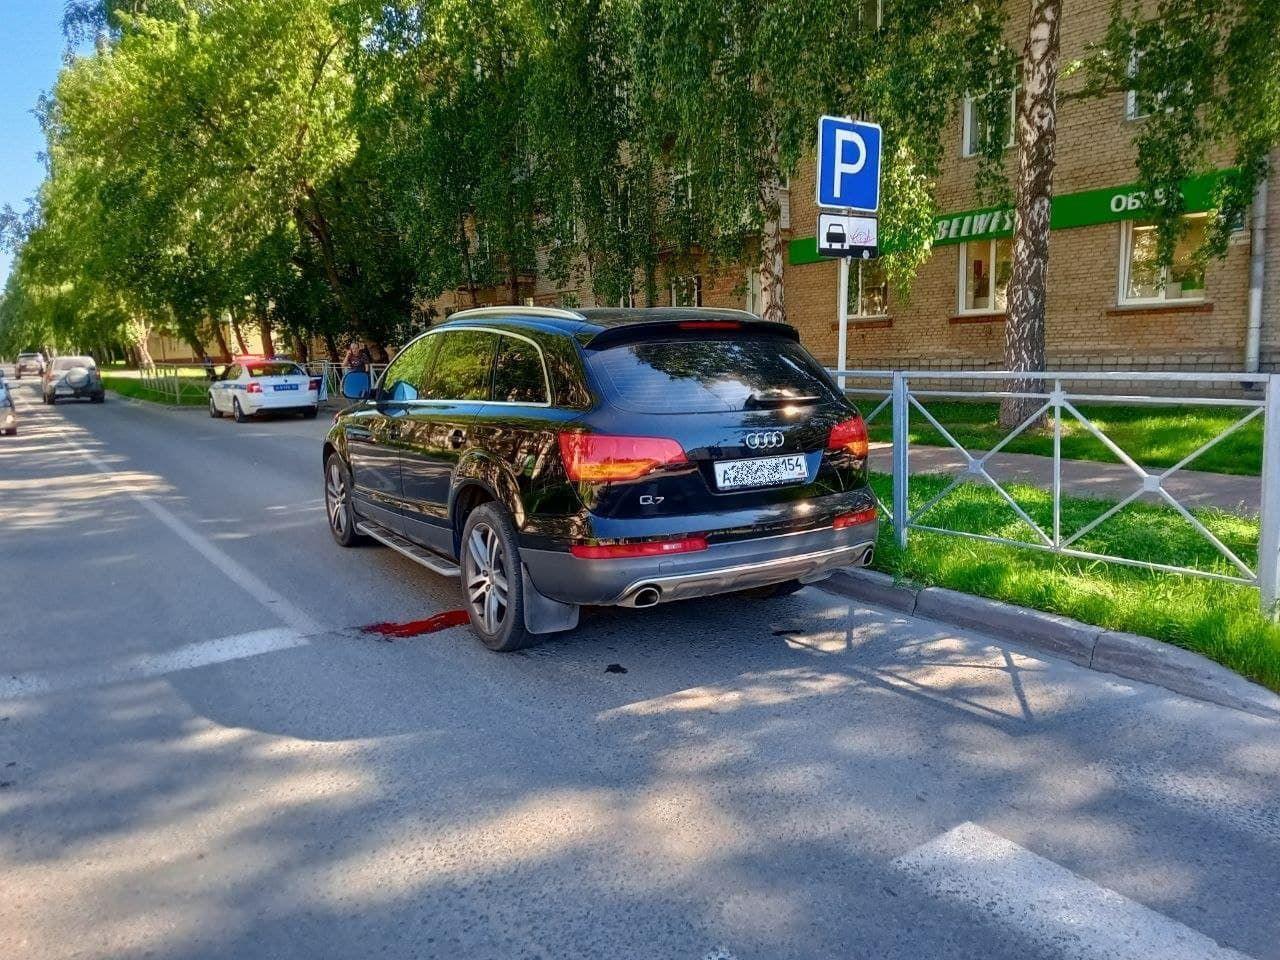 Фото Полиция проводит проверку по факту гибели ребёнка в ДТП в Новосибирске 2